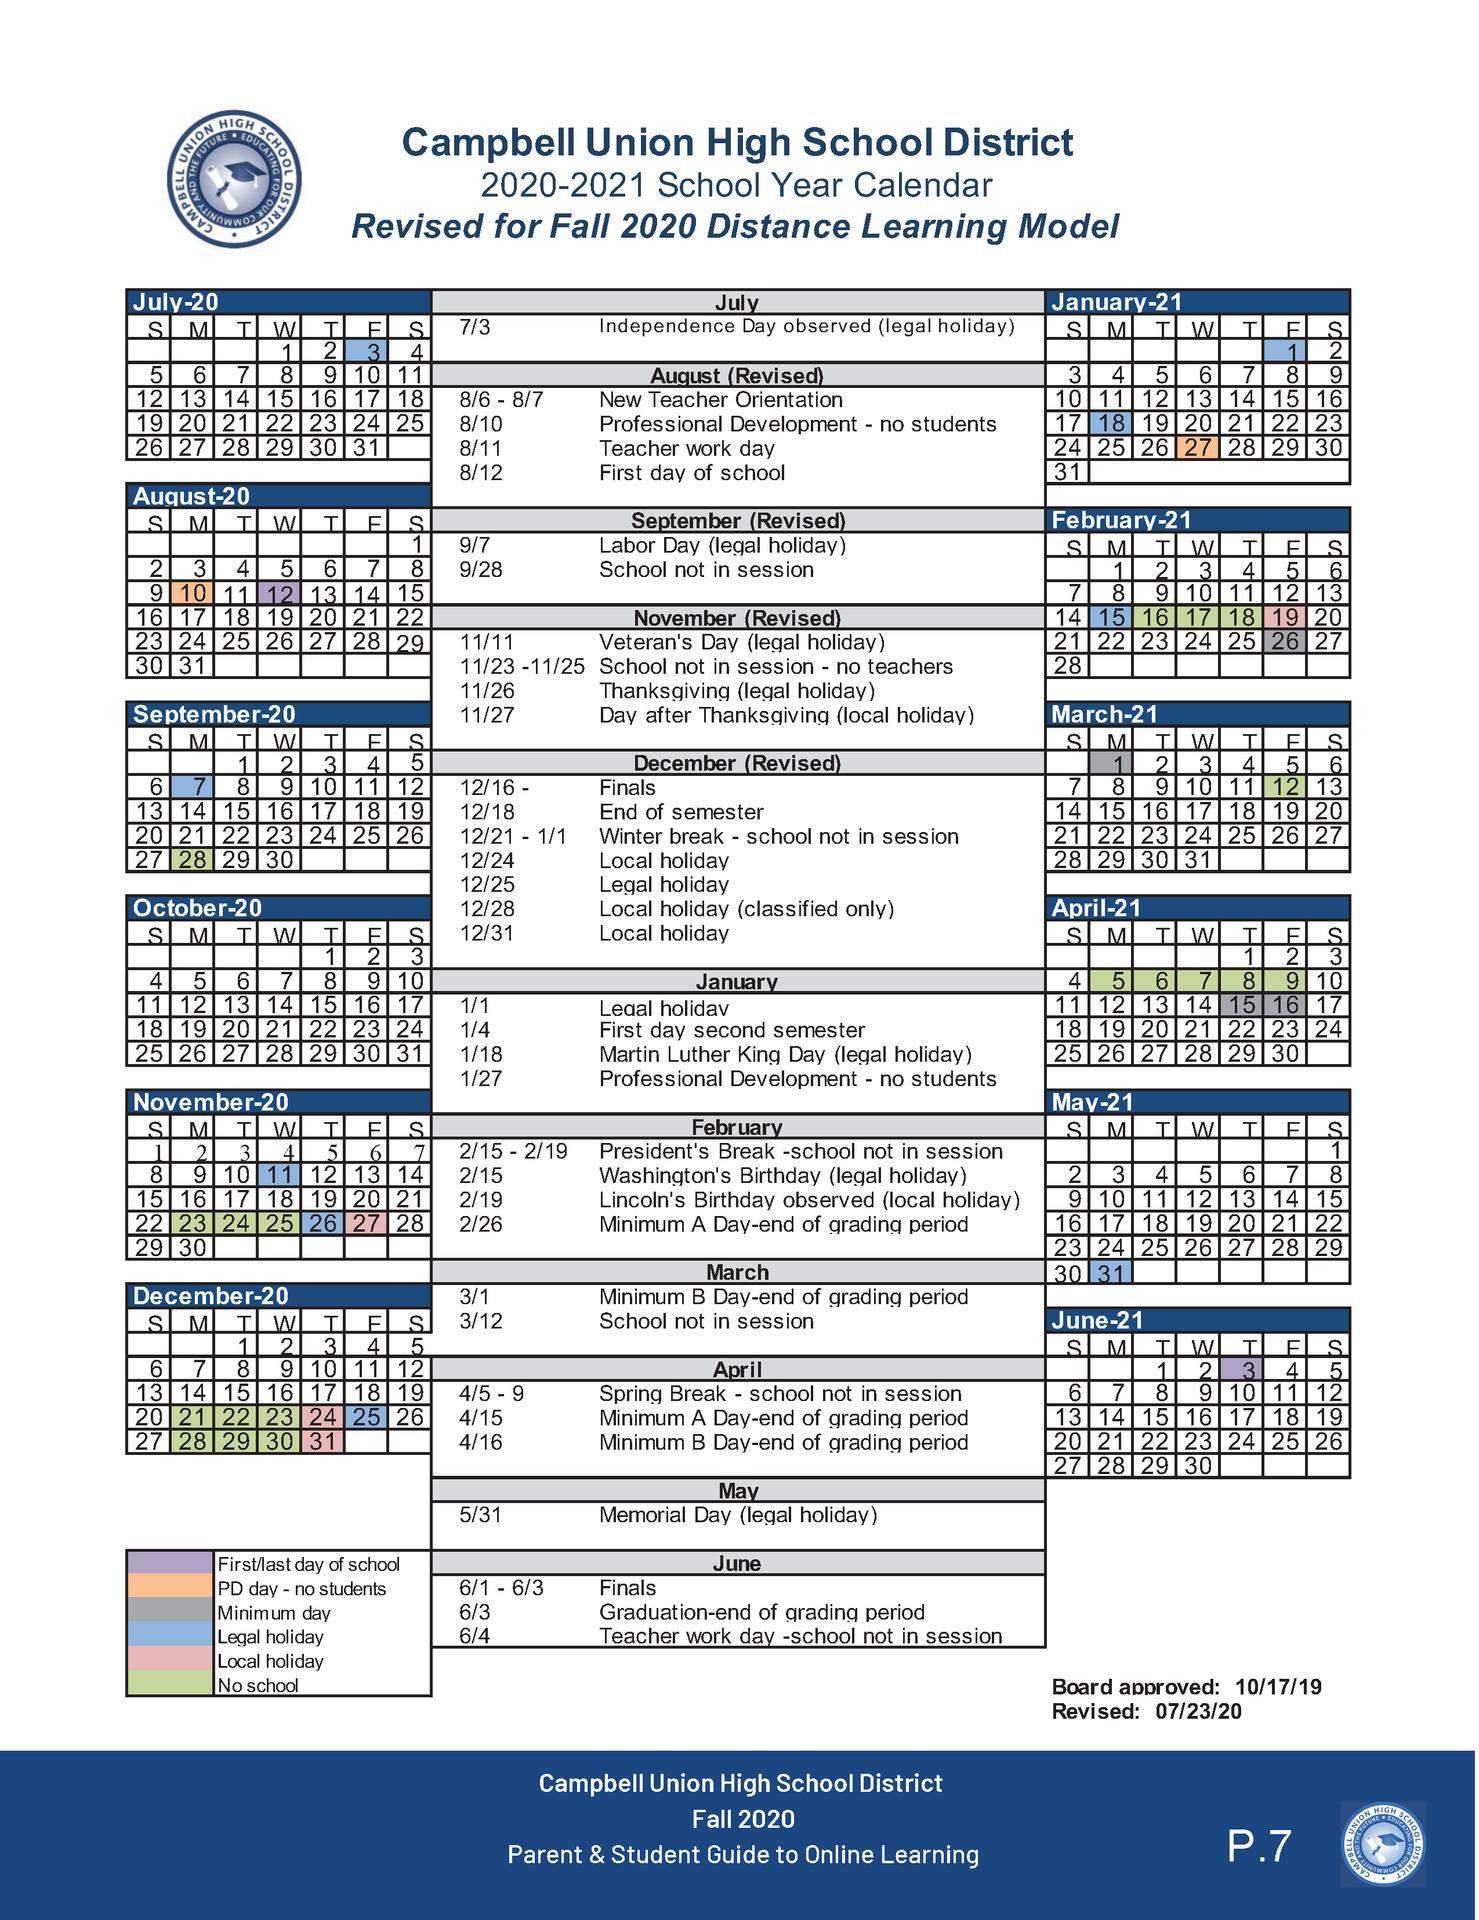 image of 2020-21 CUHSD academic calendar